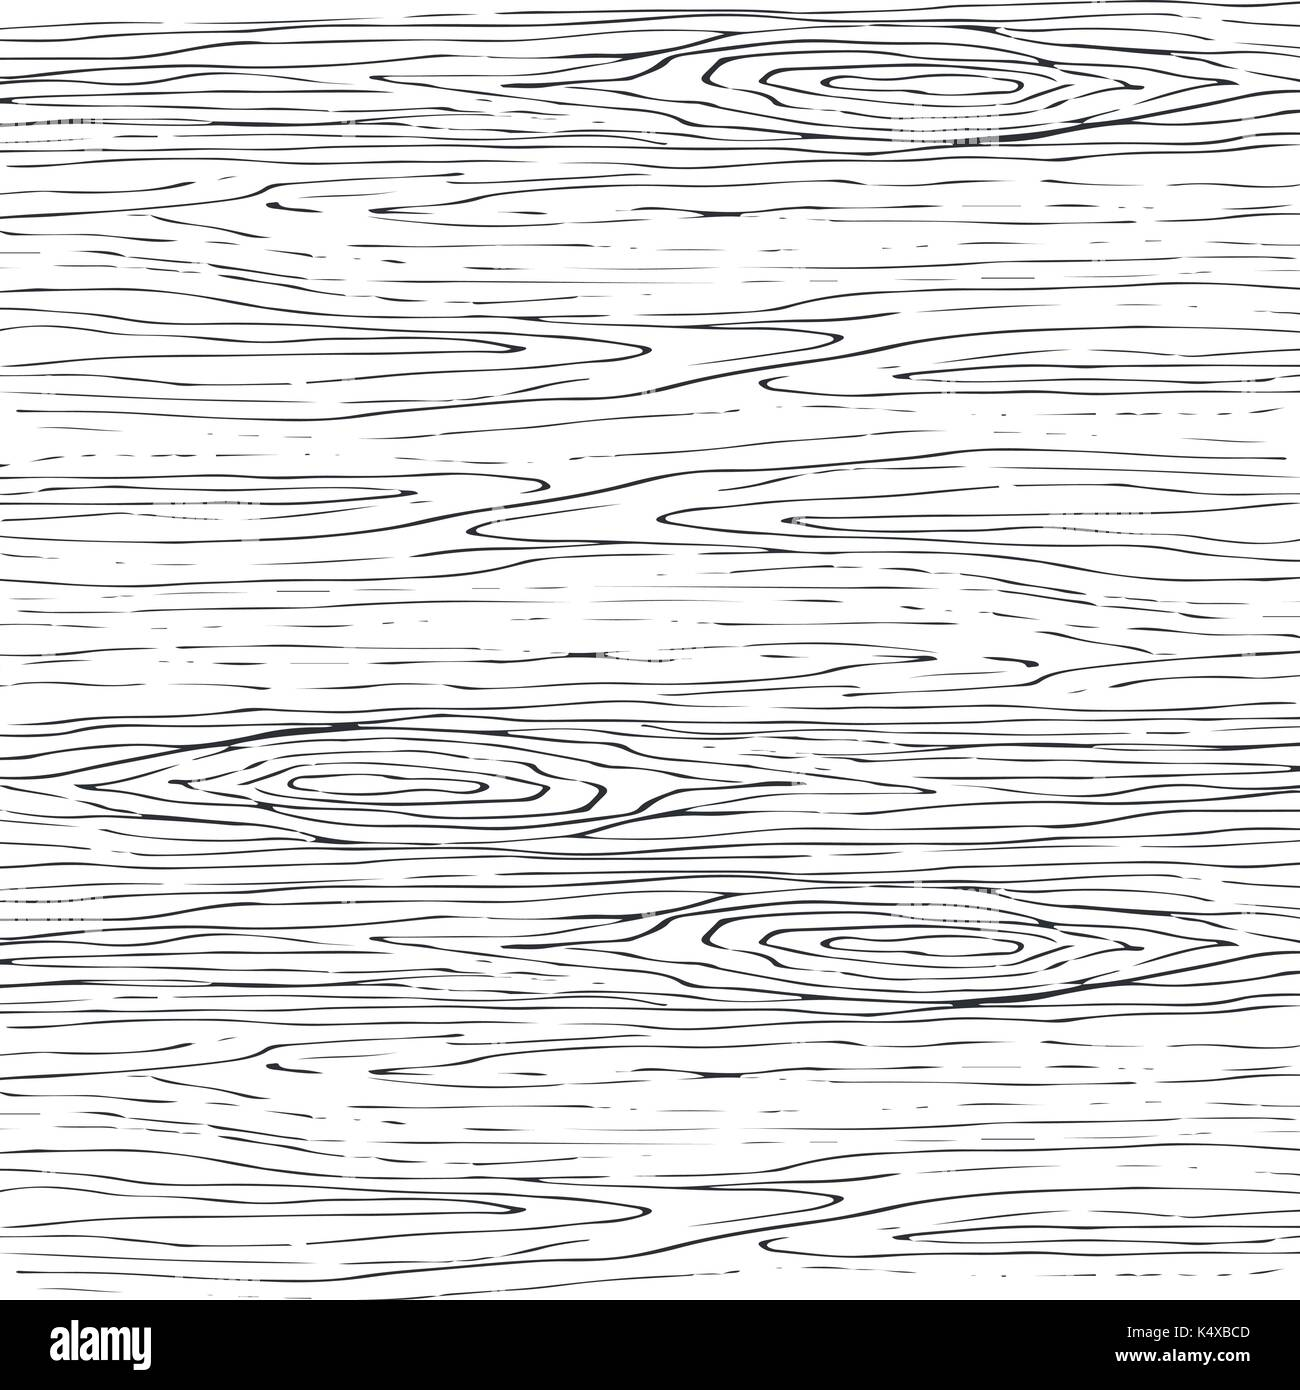 Seamless Wood Grain Gray Pattern Wooden Texture Vector Background Stock Vector Image Art Alamy